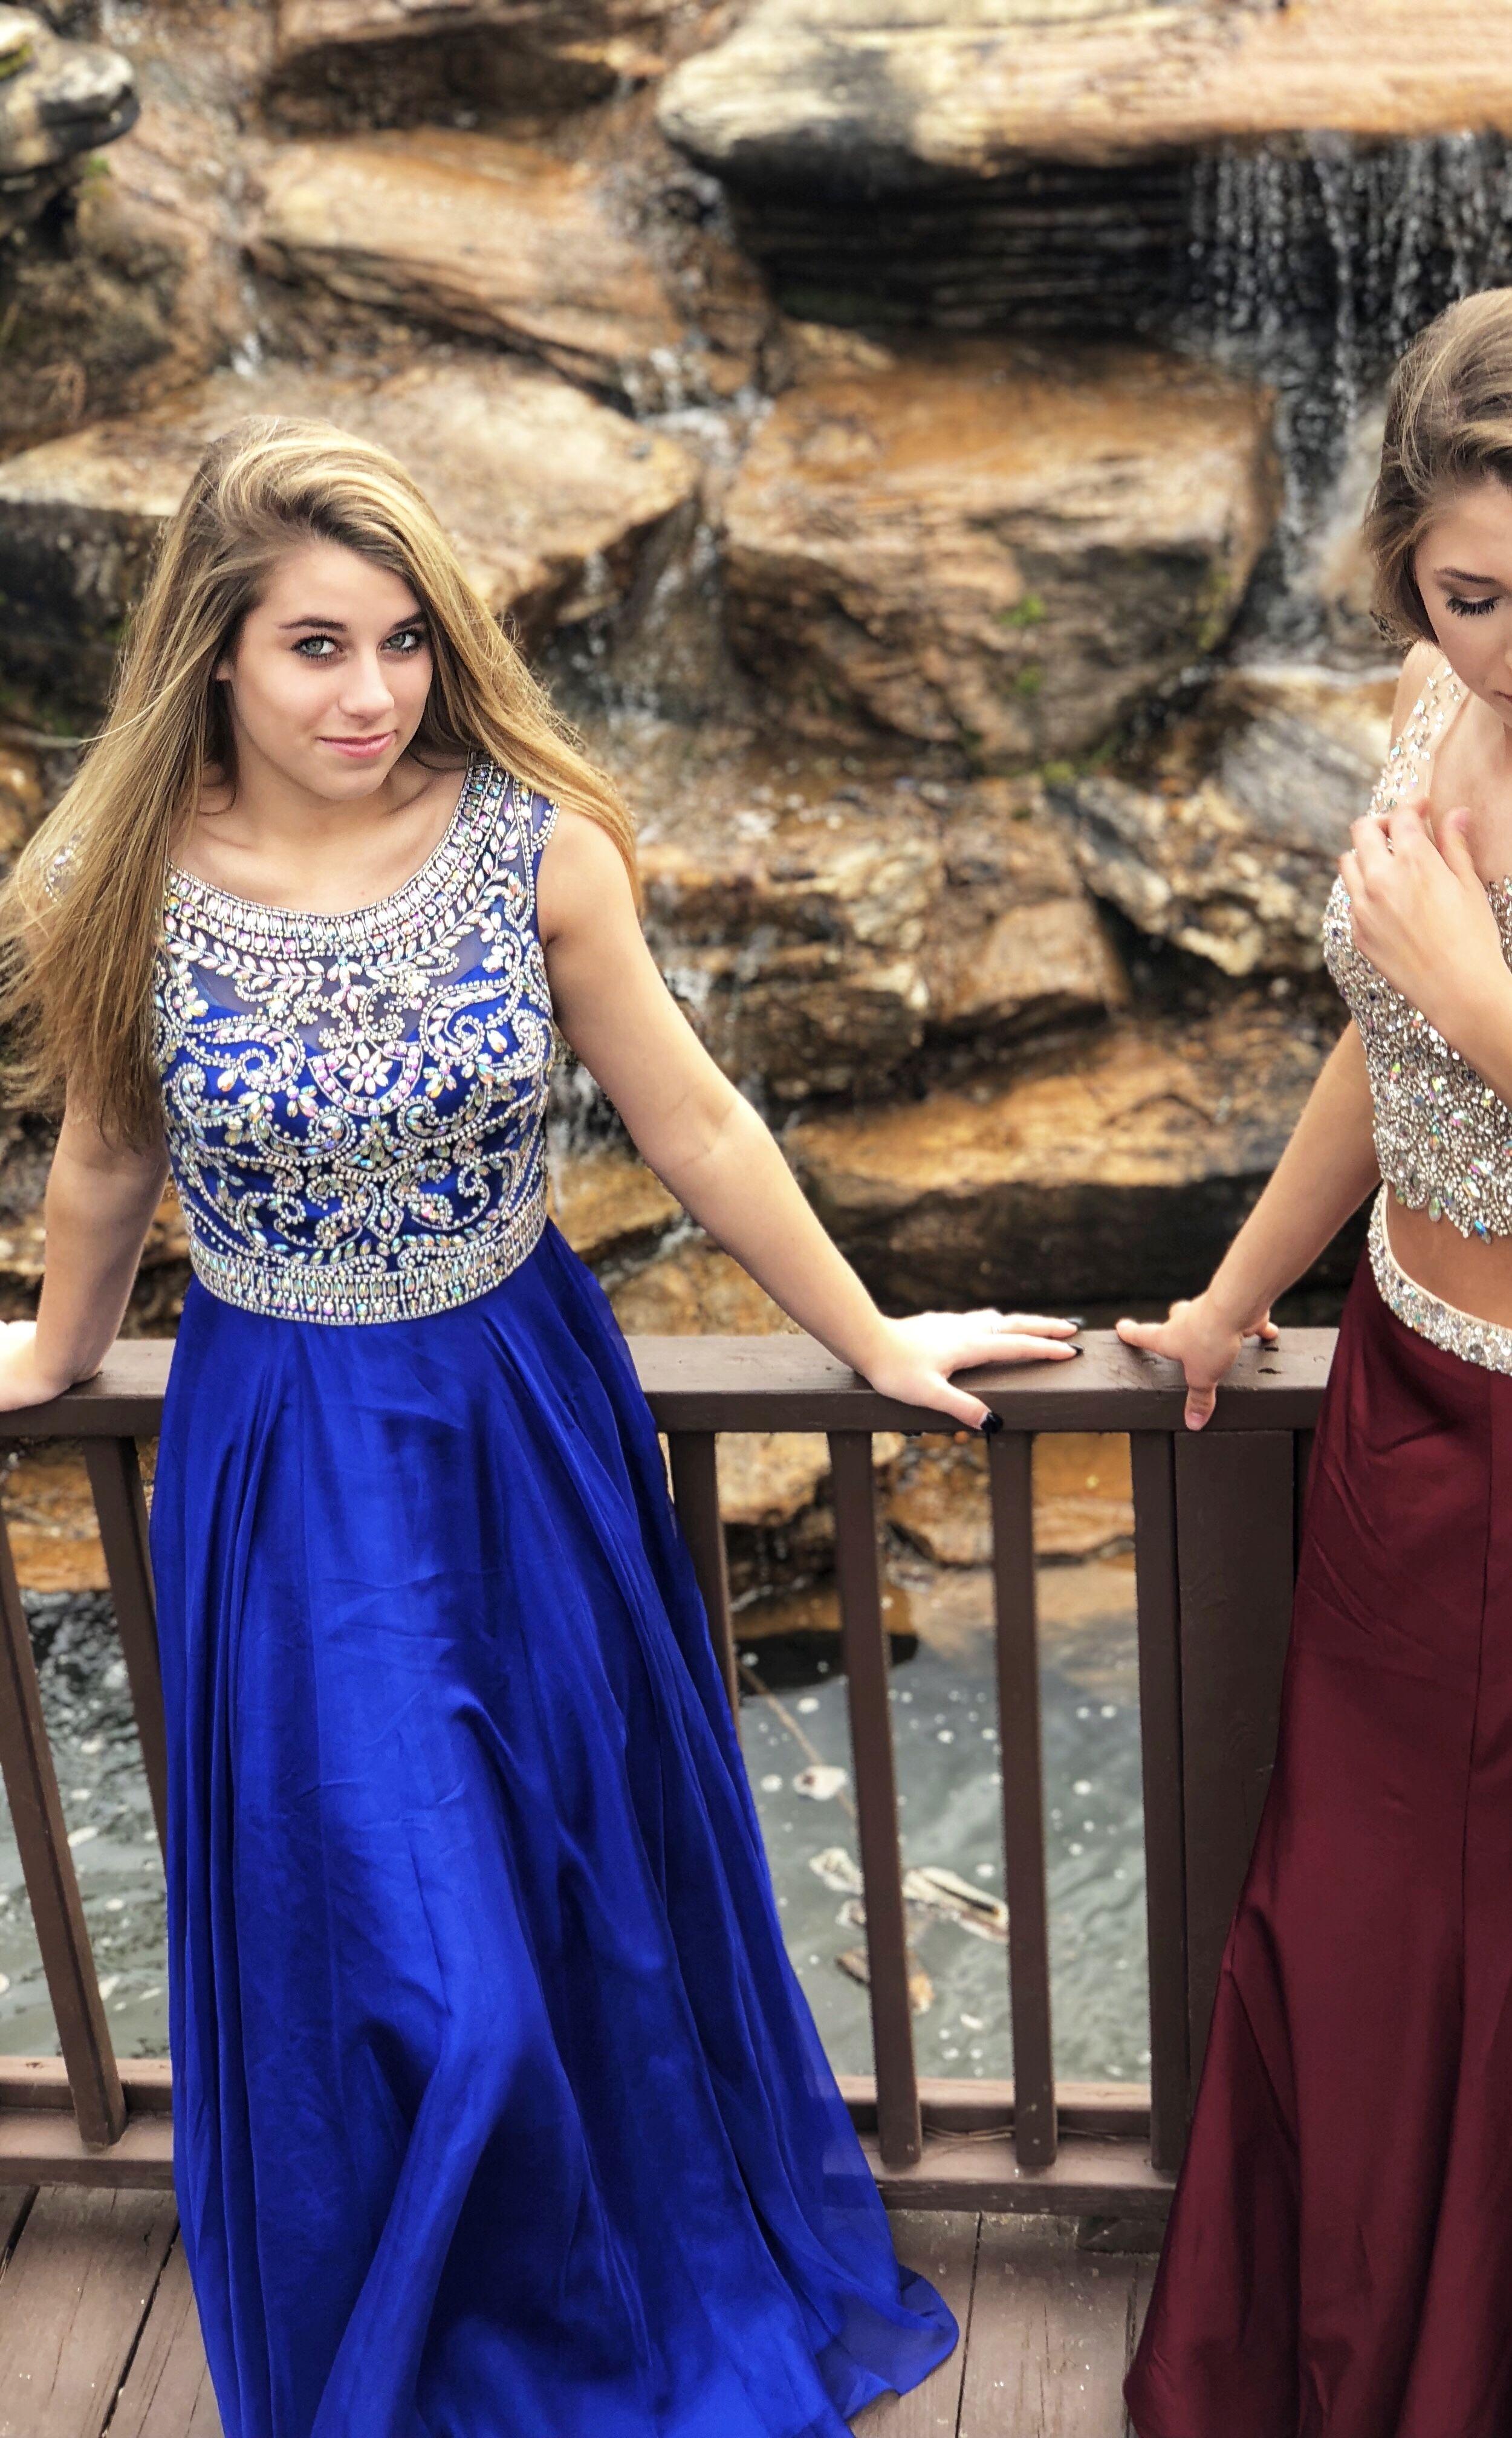 Blue Prom Dress #amiesbridal #georgia #prom #prom2018 #northgeorgia ...